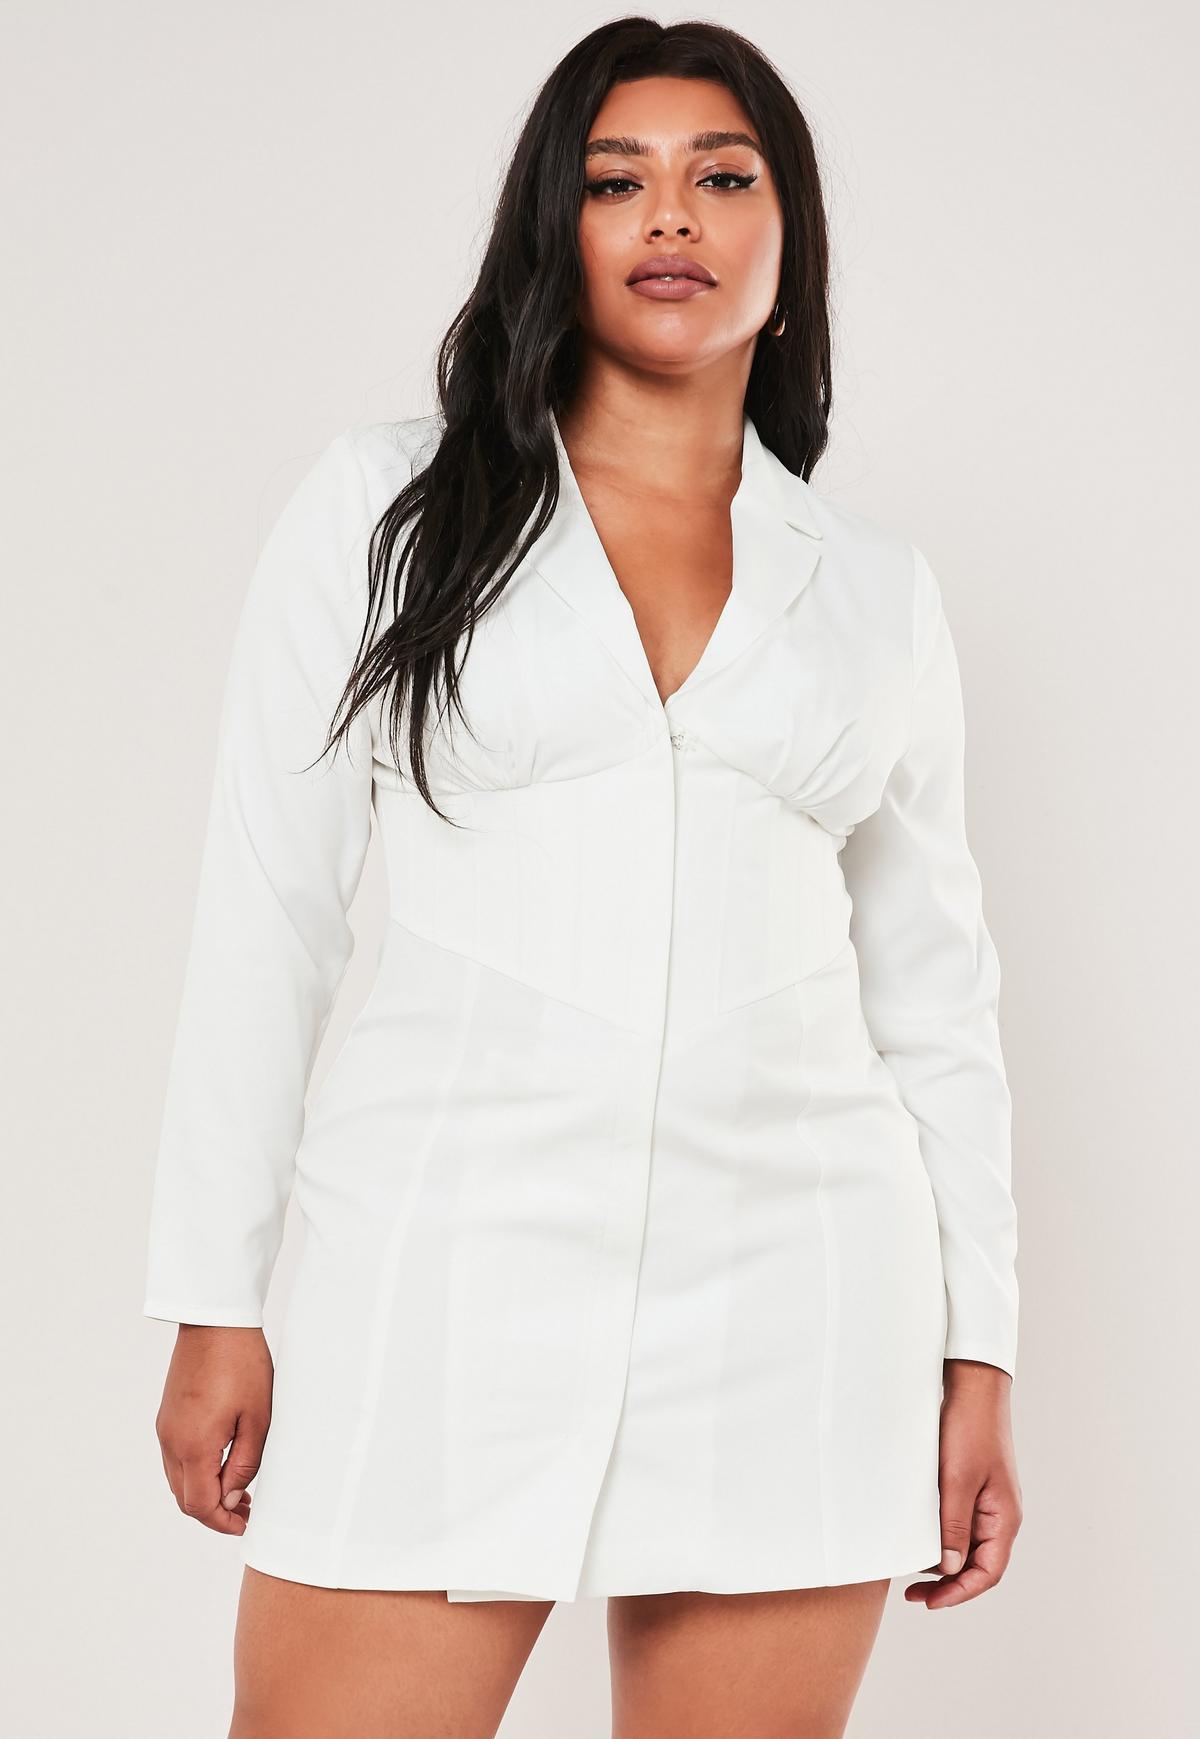 Plus Size Stassie x Missguided White Corset Blazer Dress